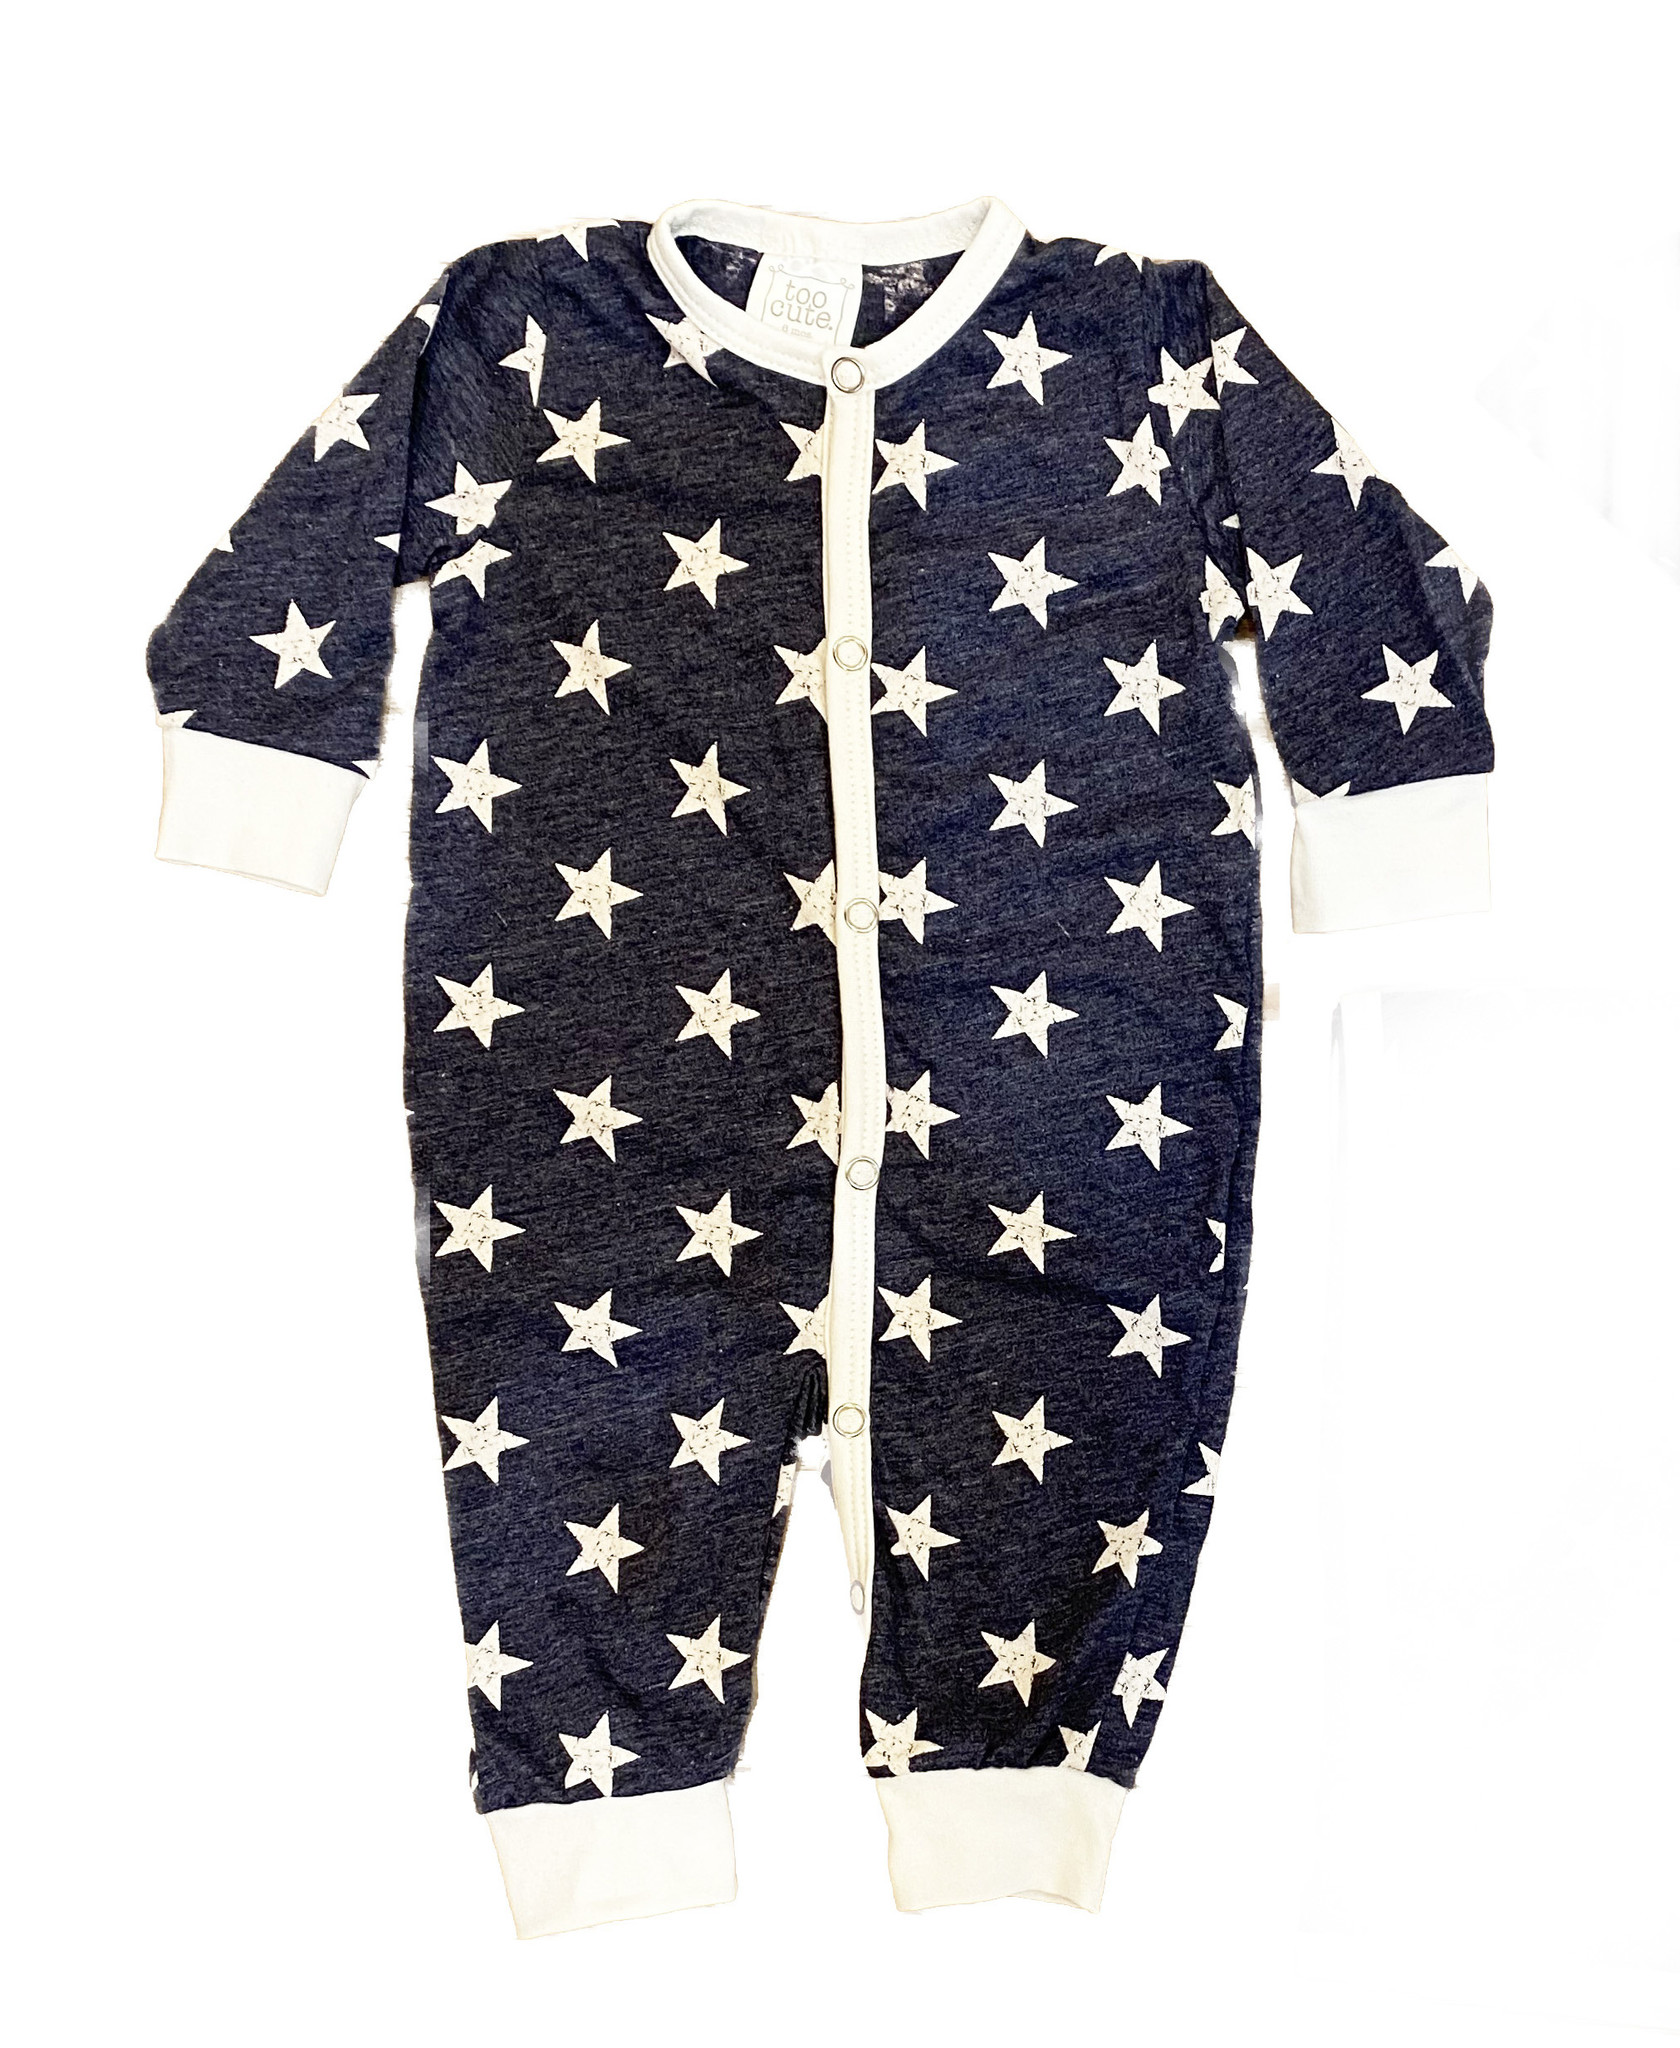 Too Cute Denim Stars Outfit